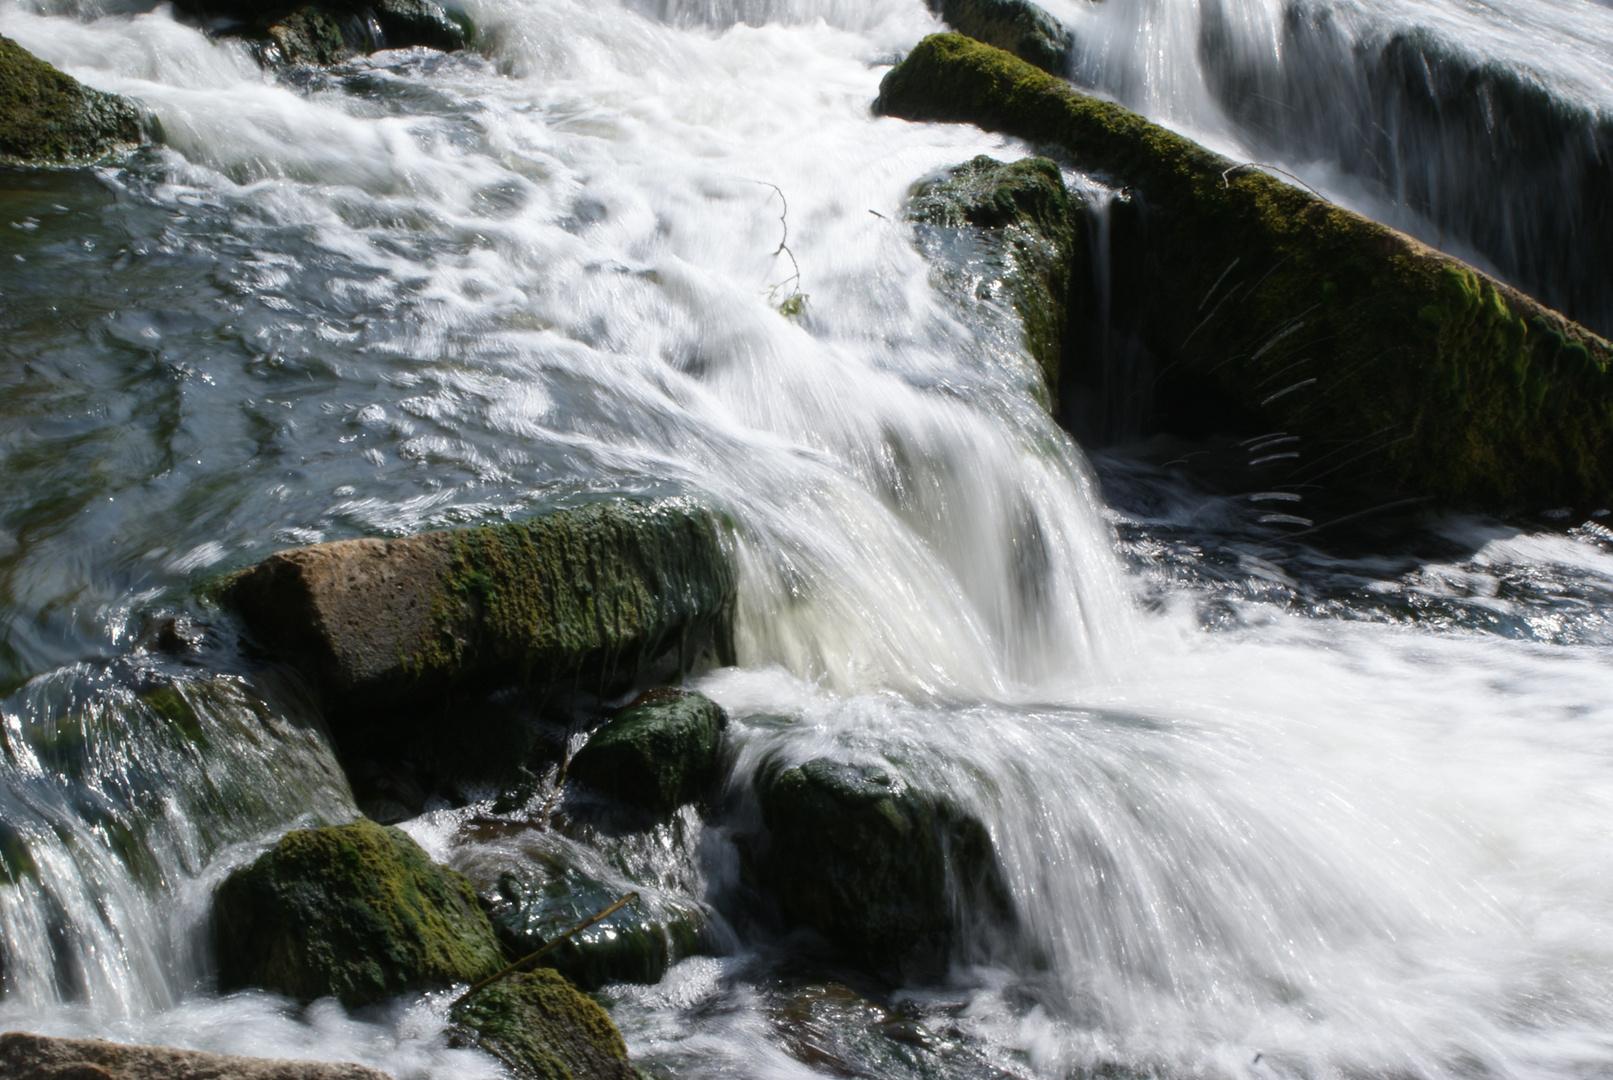 Wasserfall Neustadt